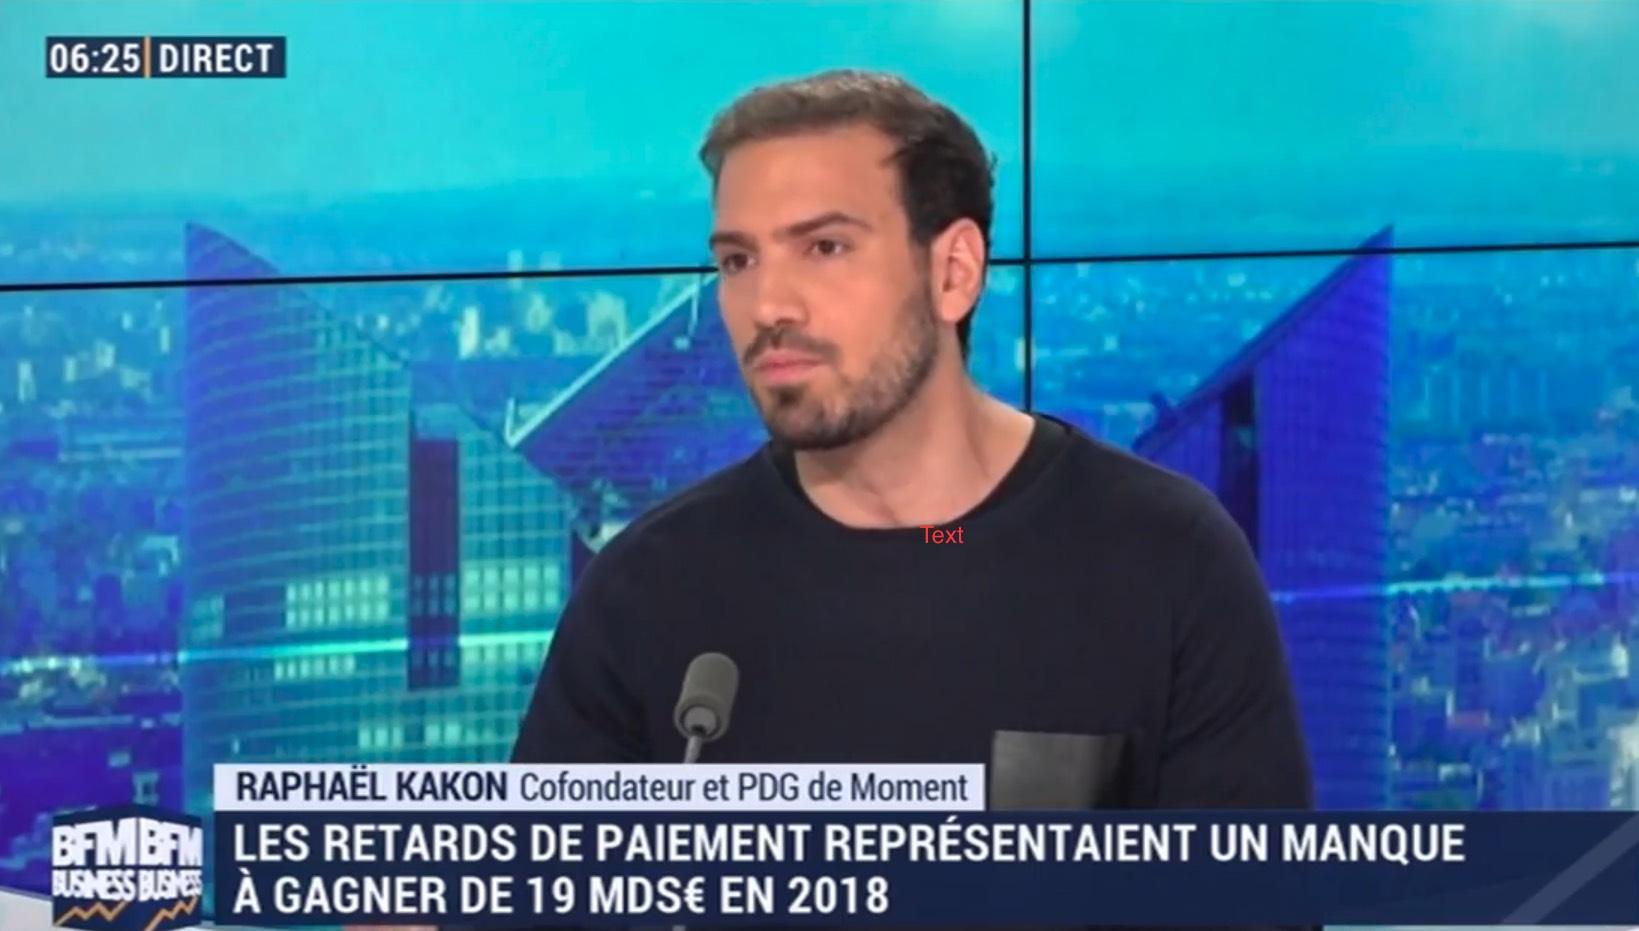 Kakon screen interview BFMTV